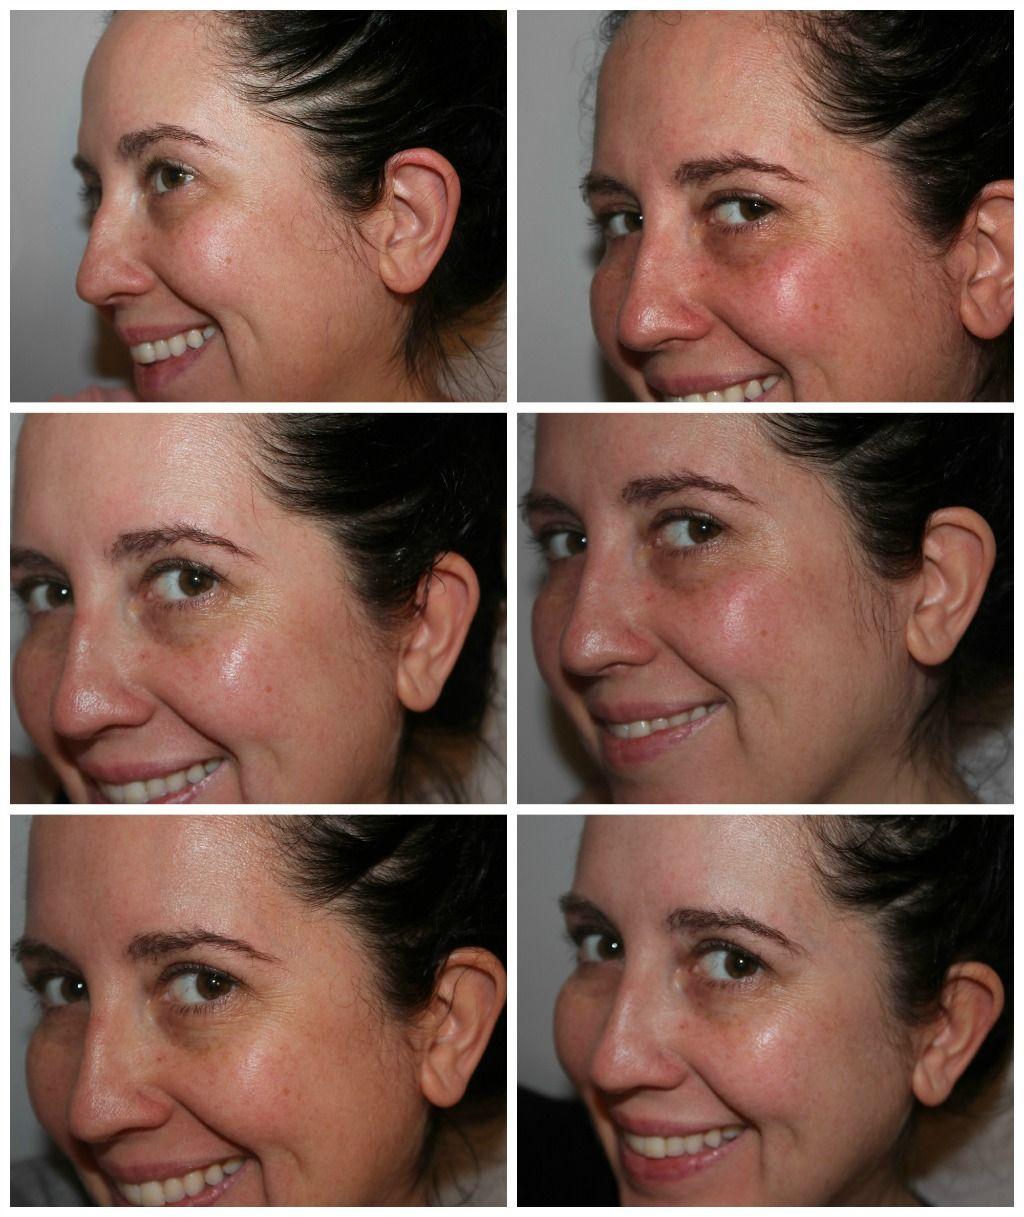 Cách sử dụng kem dưỡng ẩm Neutrogena Rapid Wrinkle Repair